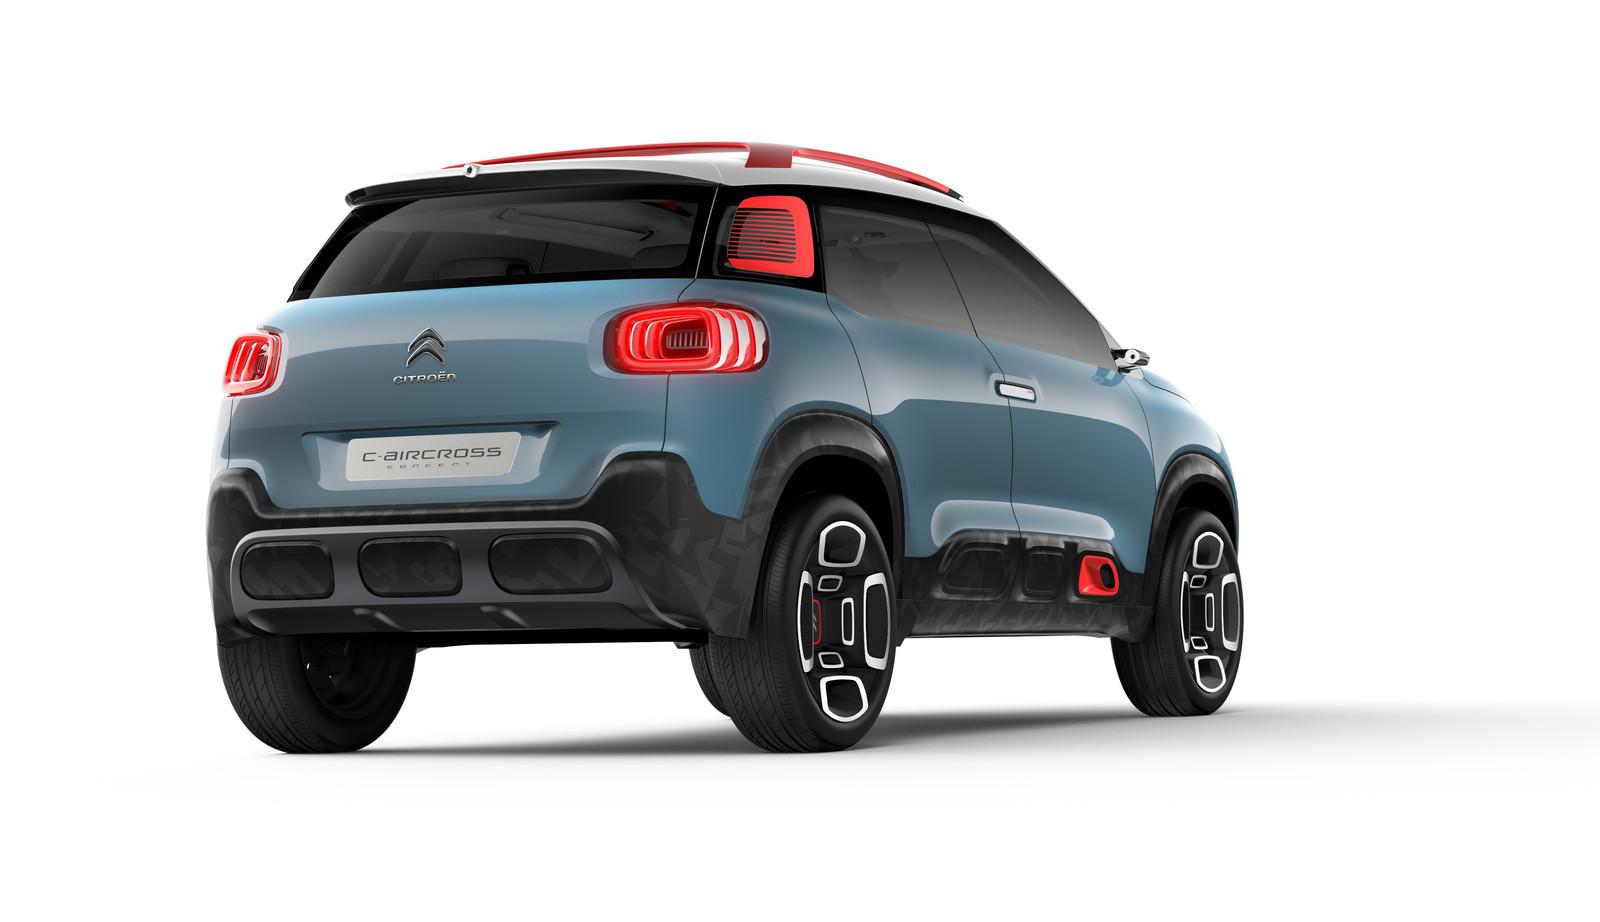 Foto de Citroën C-Aircross Concept (5/12)